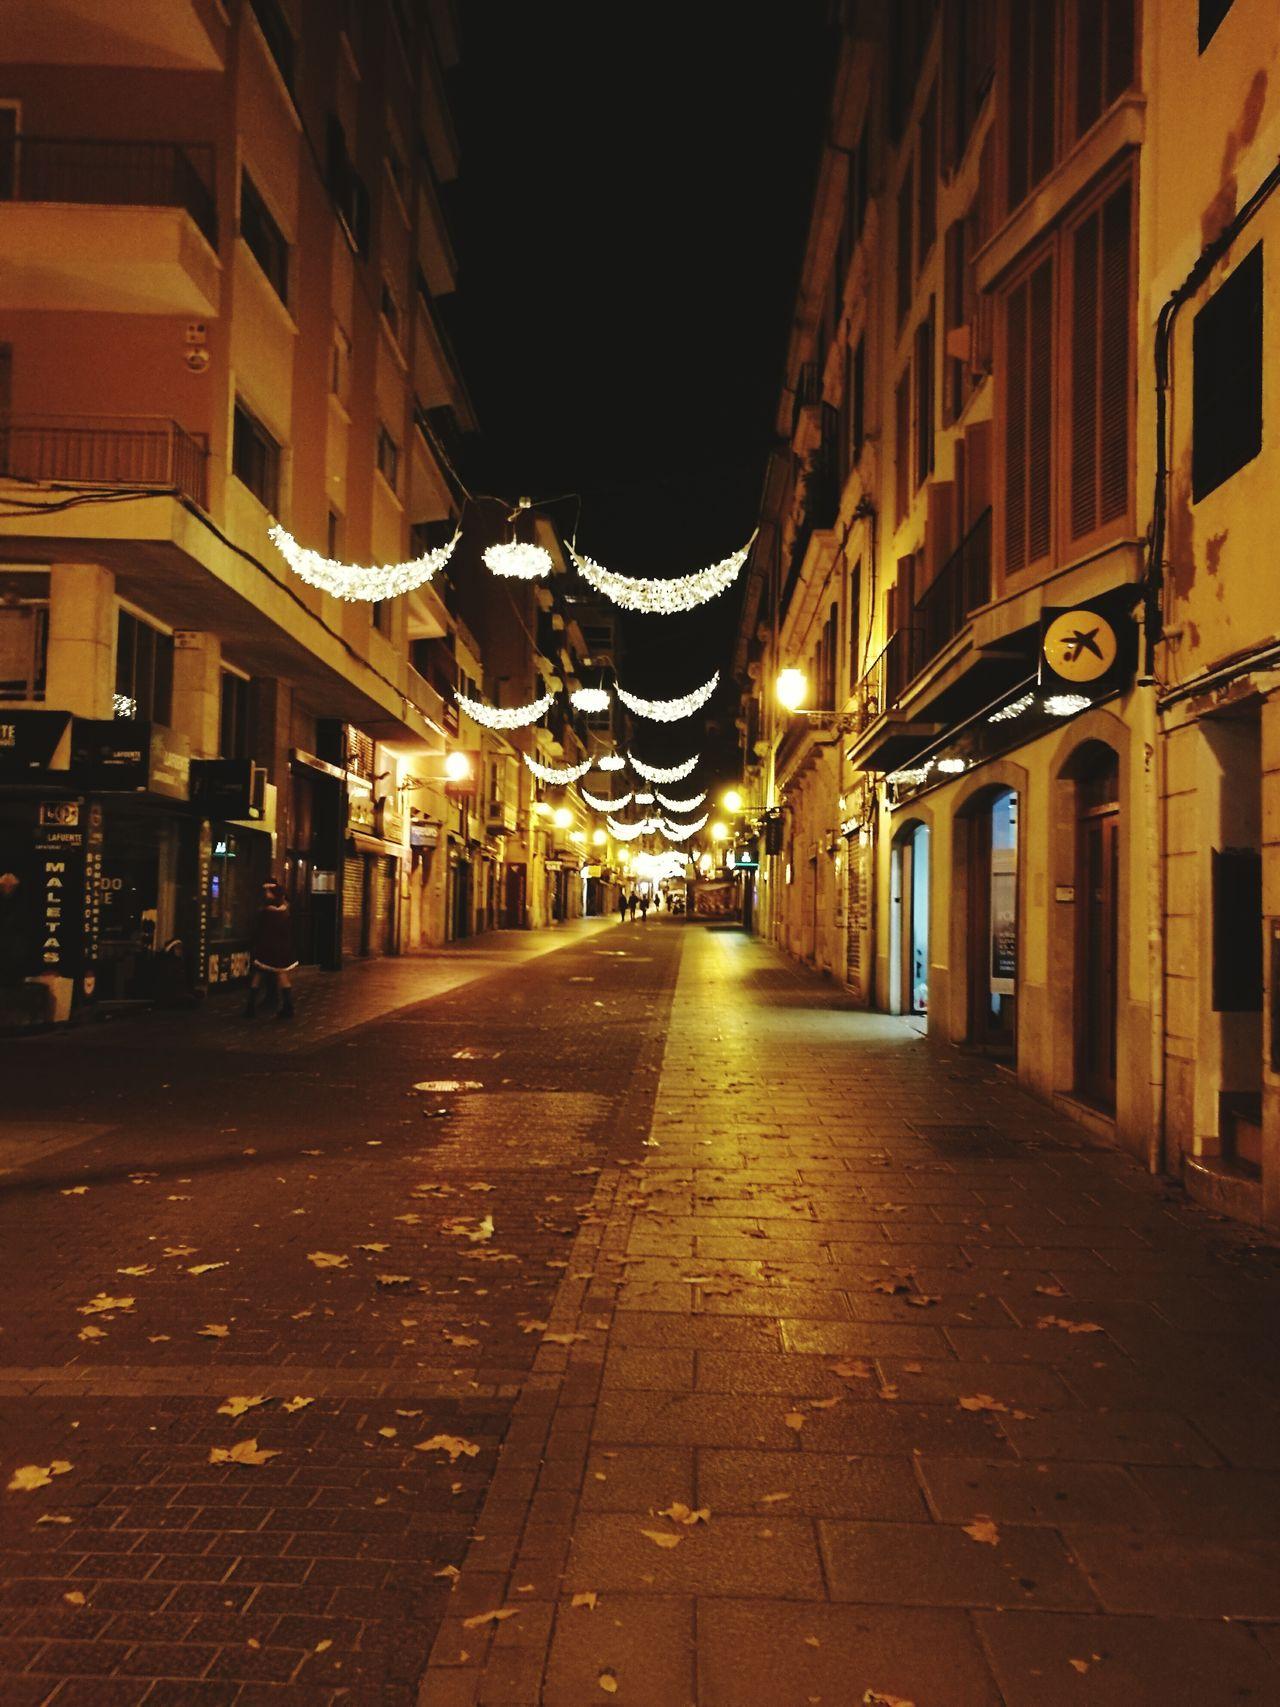 Palma De Mallorca Night Illuminated City Street Light Christmas Decoration Cityscape City Street Architecture Street